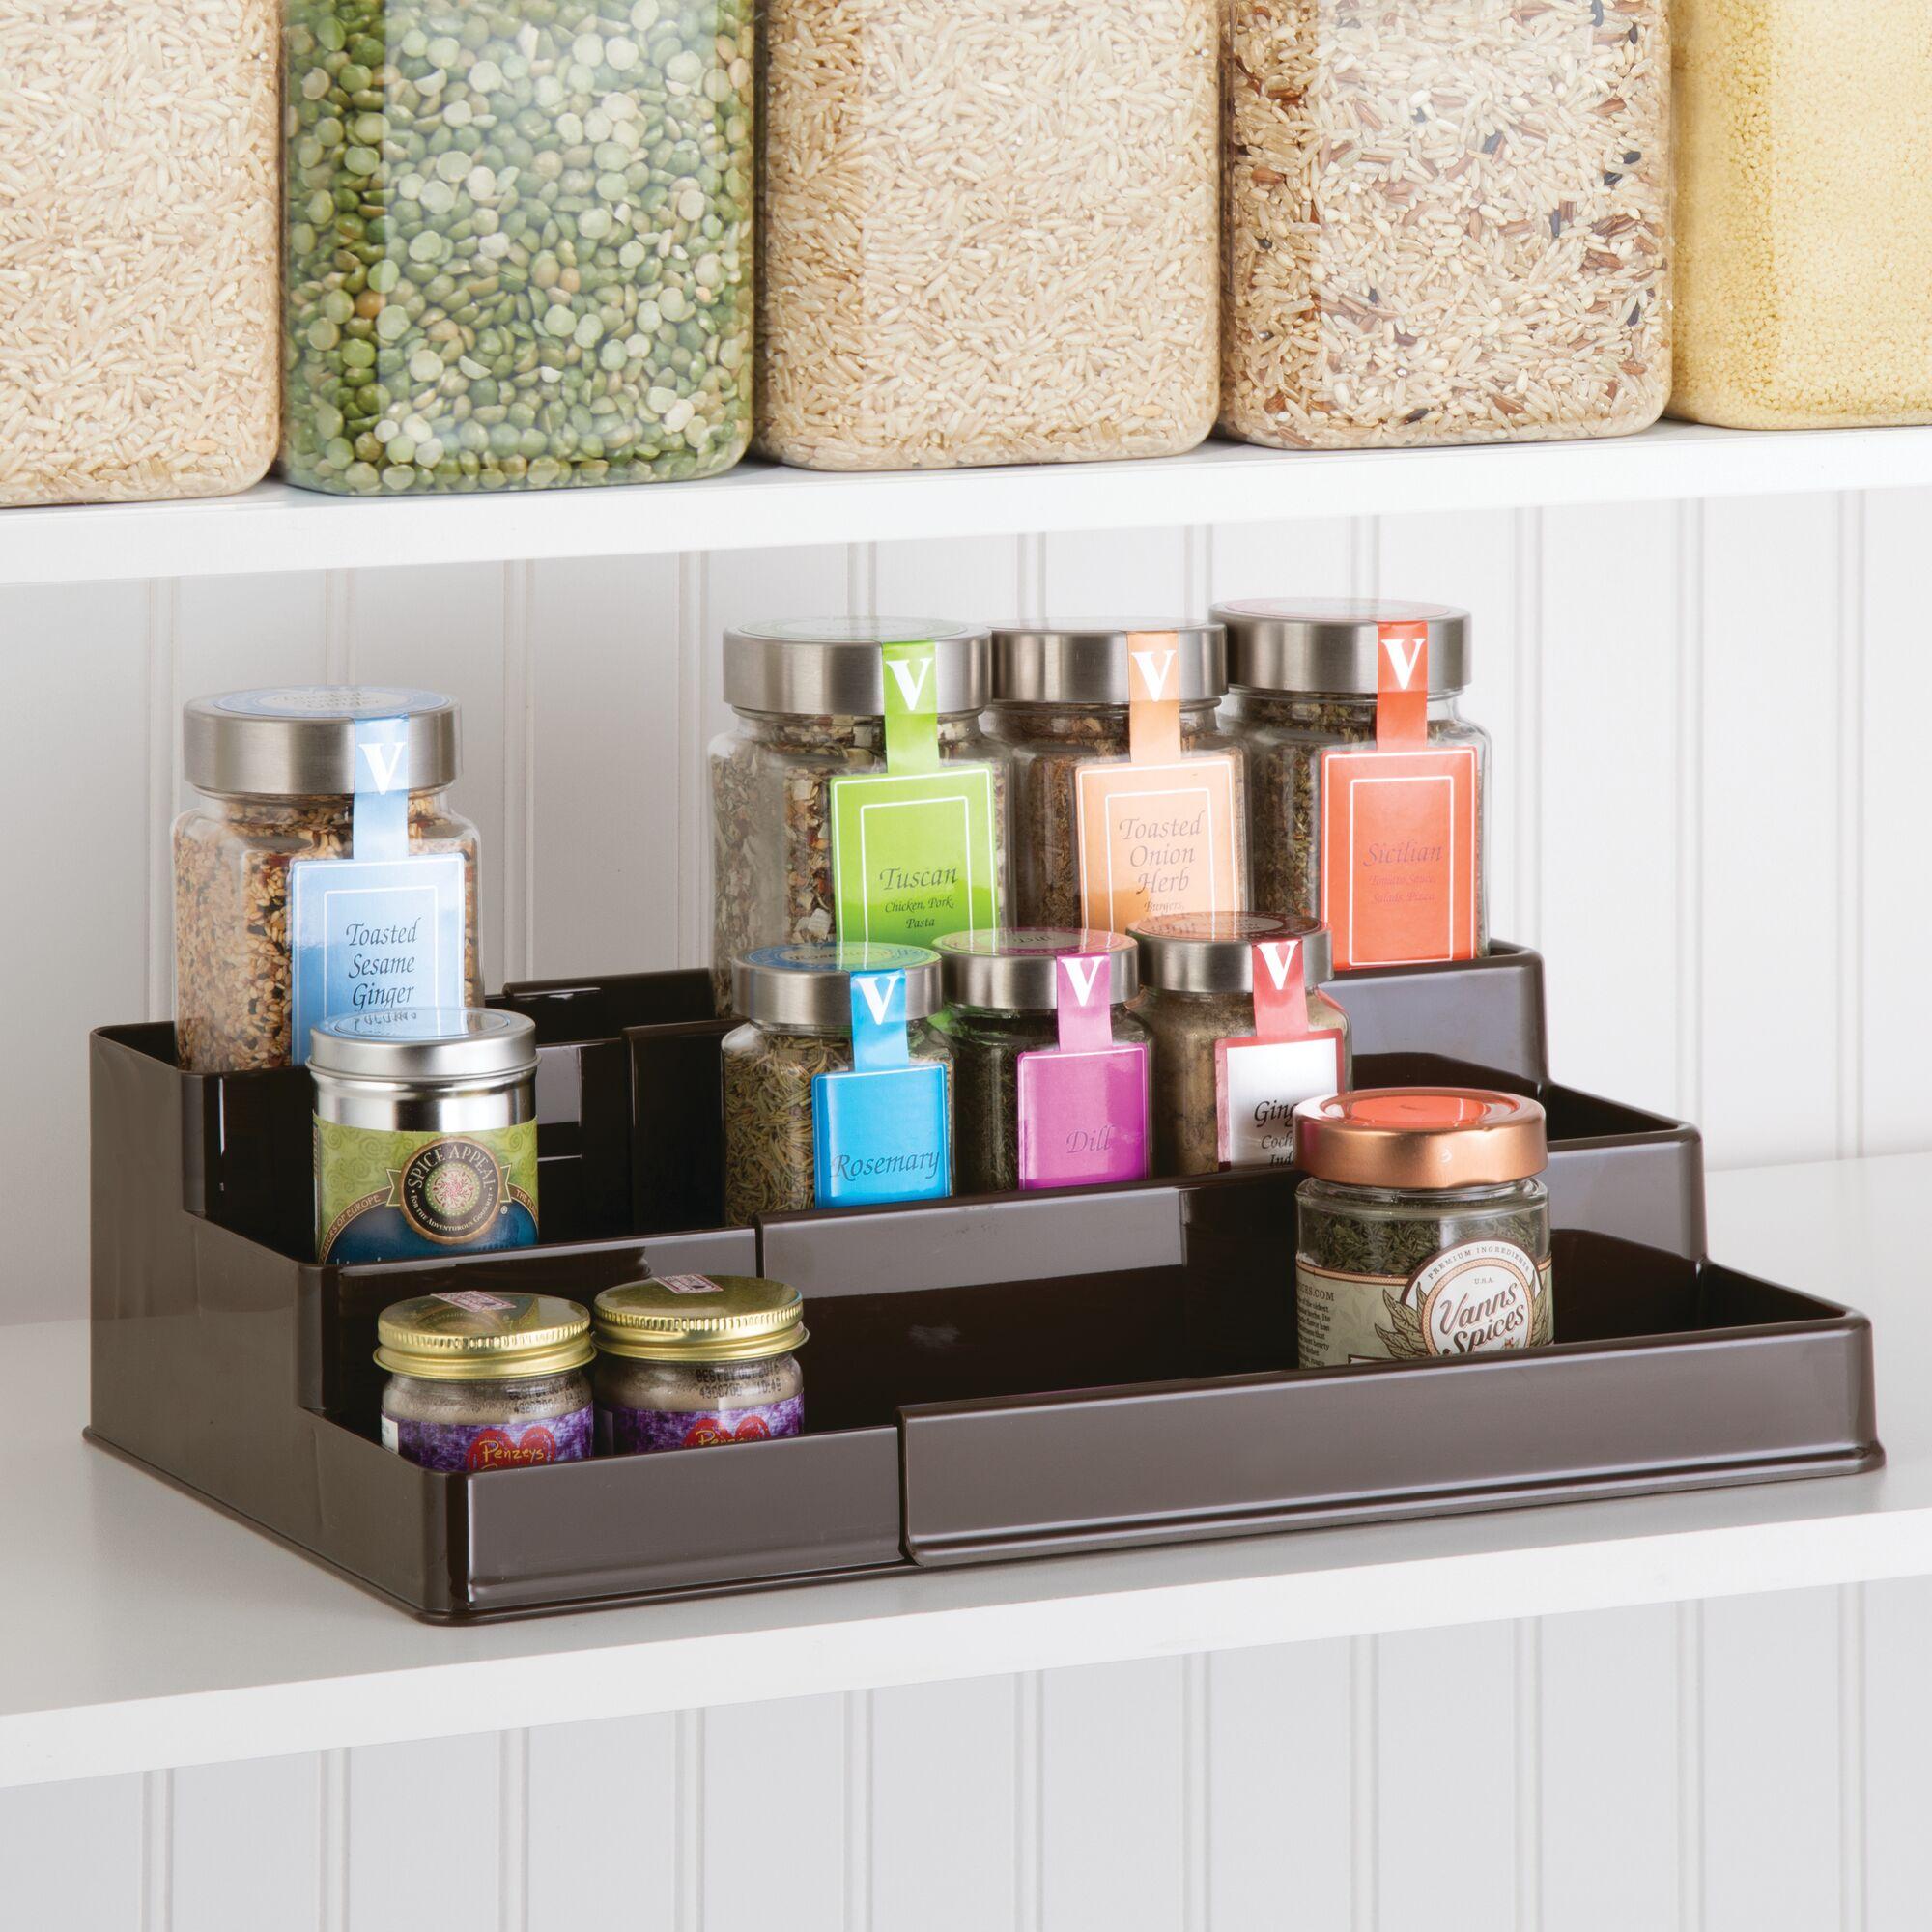 mDesign-Expandable-Kitchen-Cabinet-Pantry-Organizer-Spice-Rack thumbnail 19